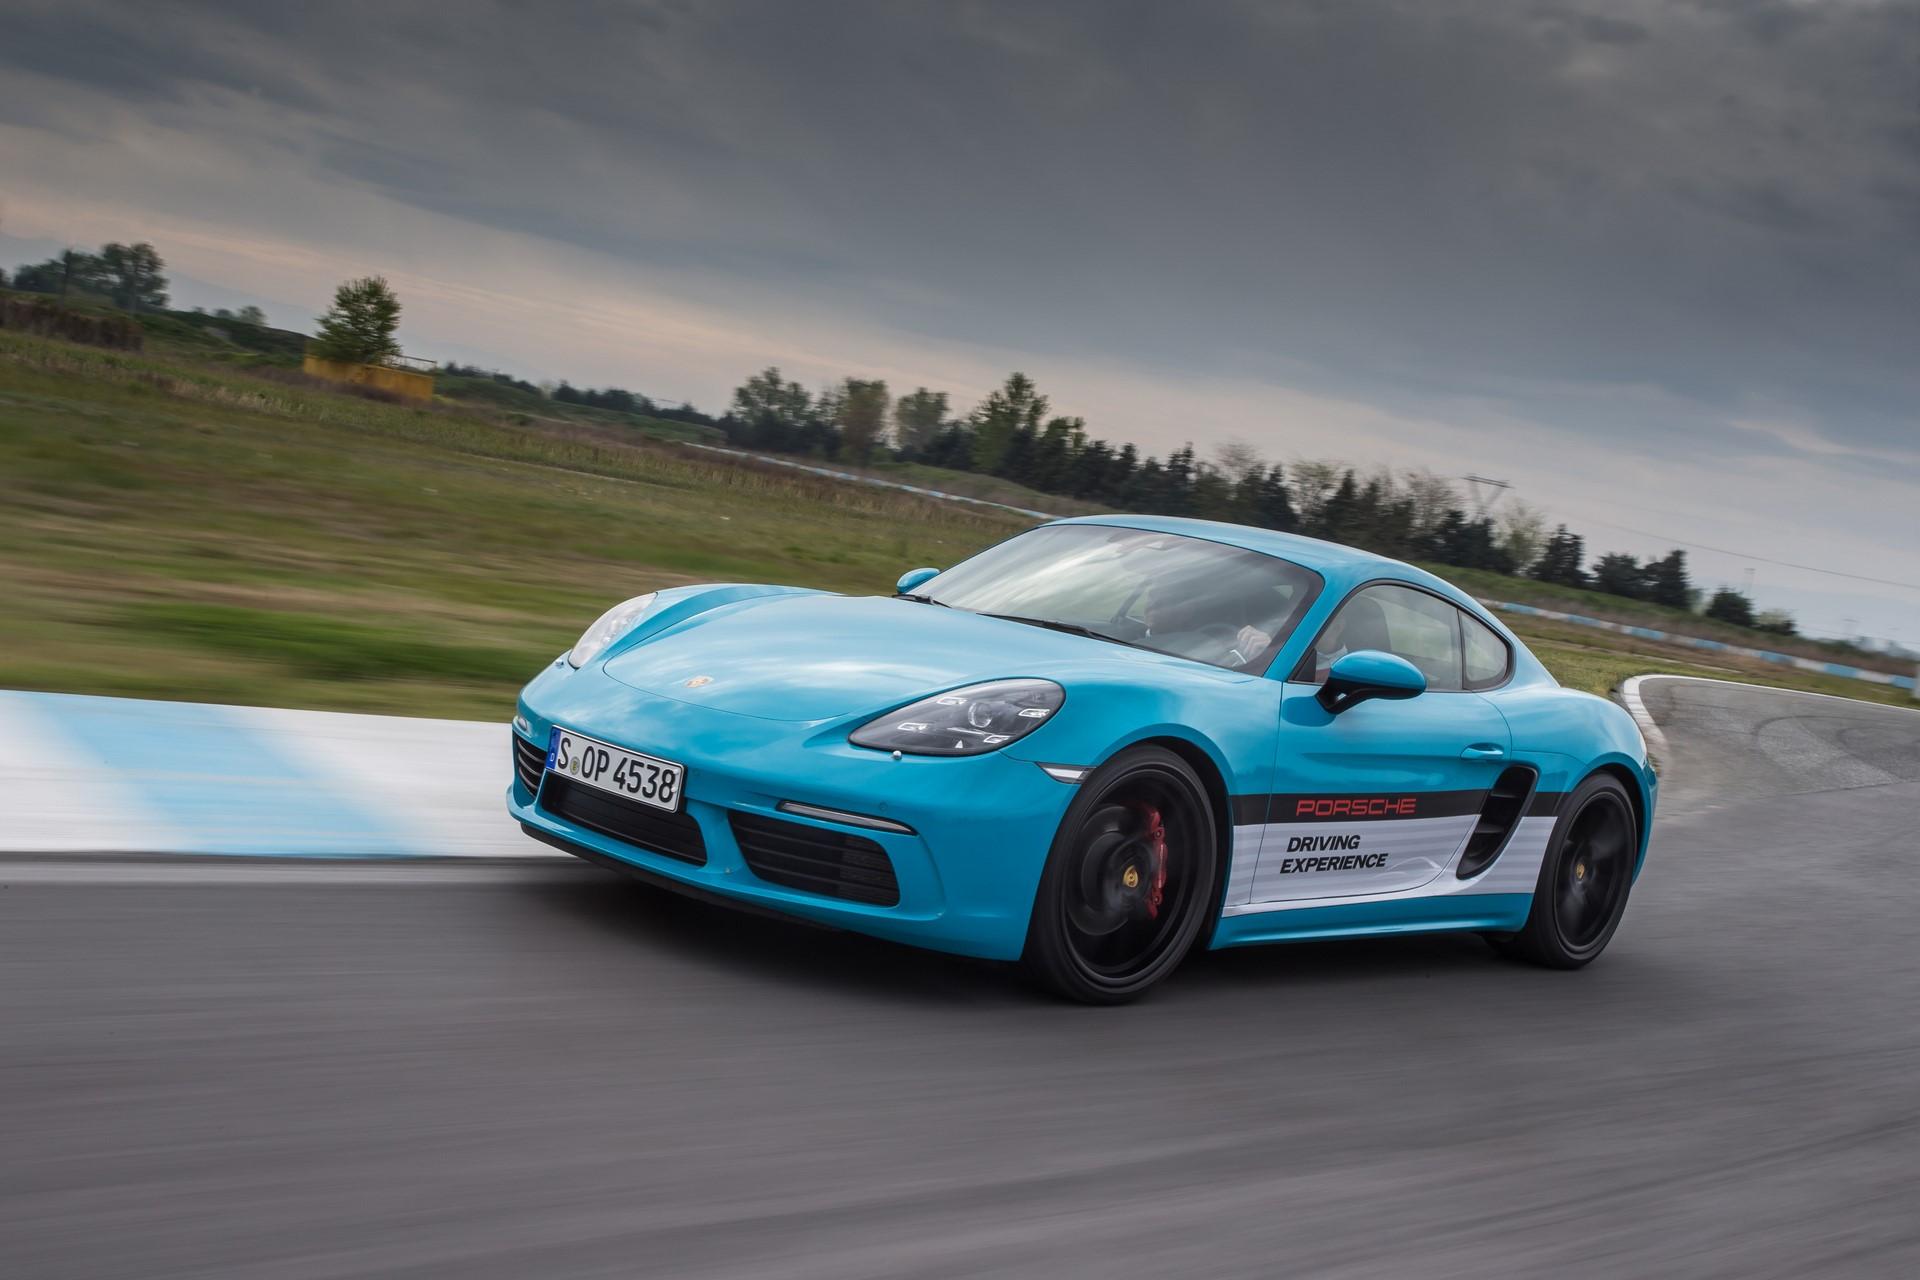 Porsche Driving Experience 2017 Serres (38)